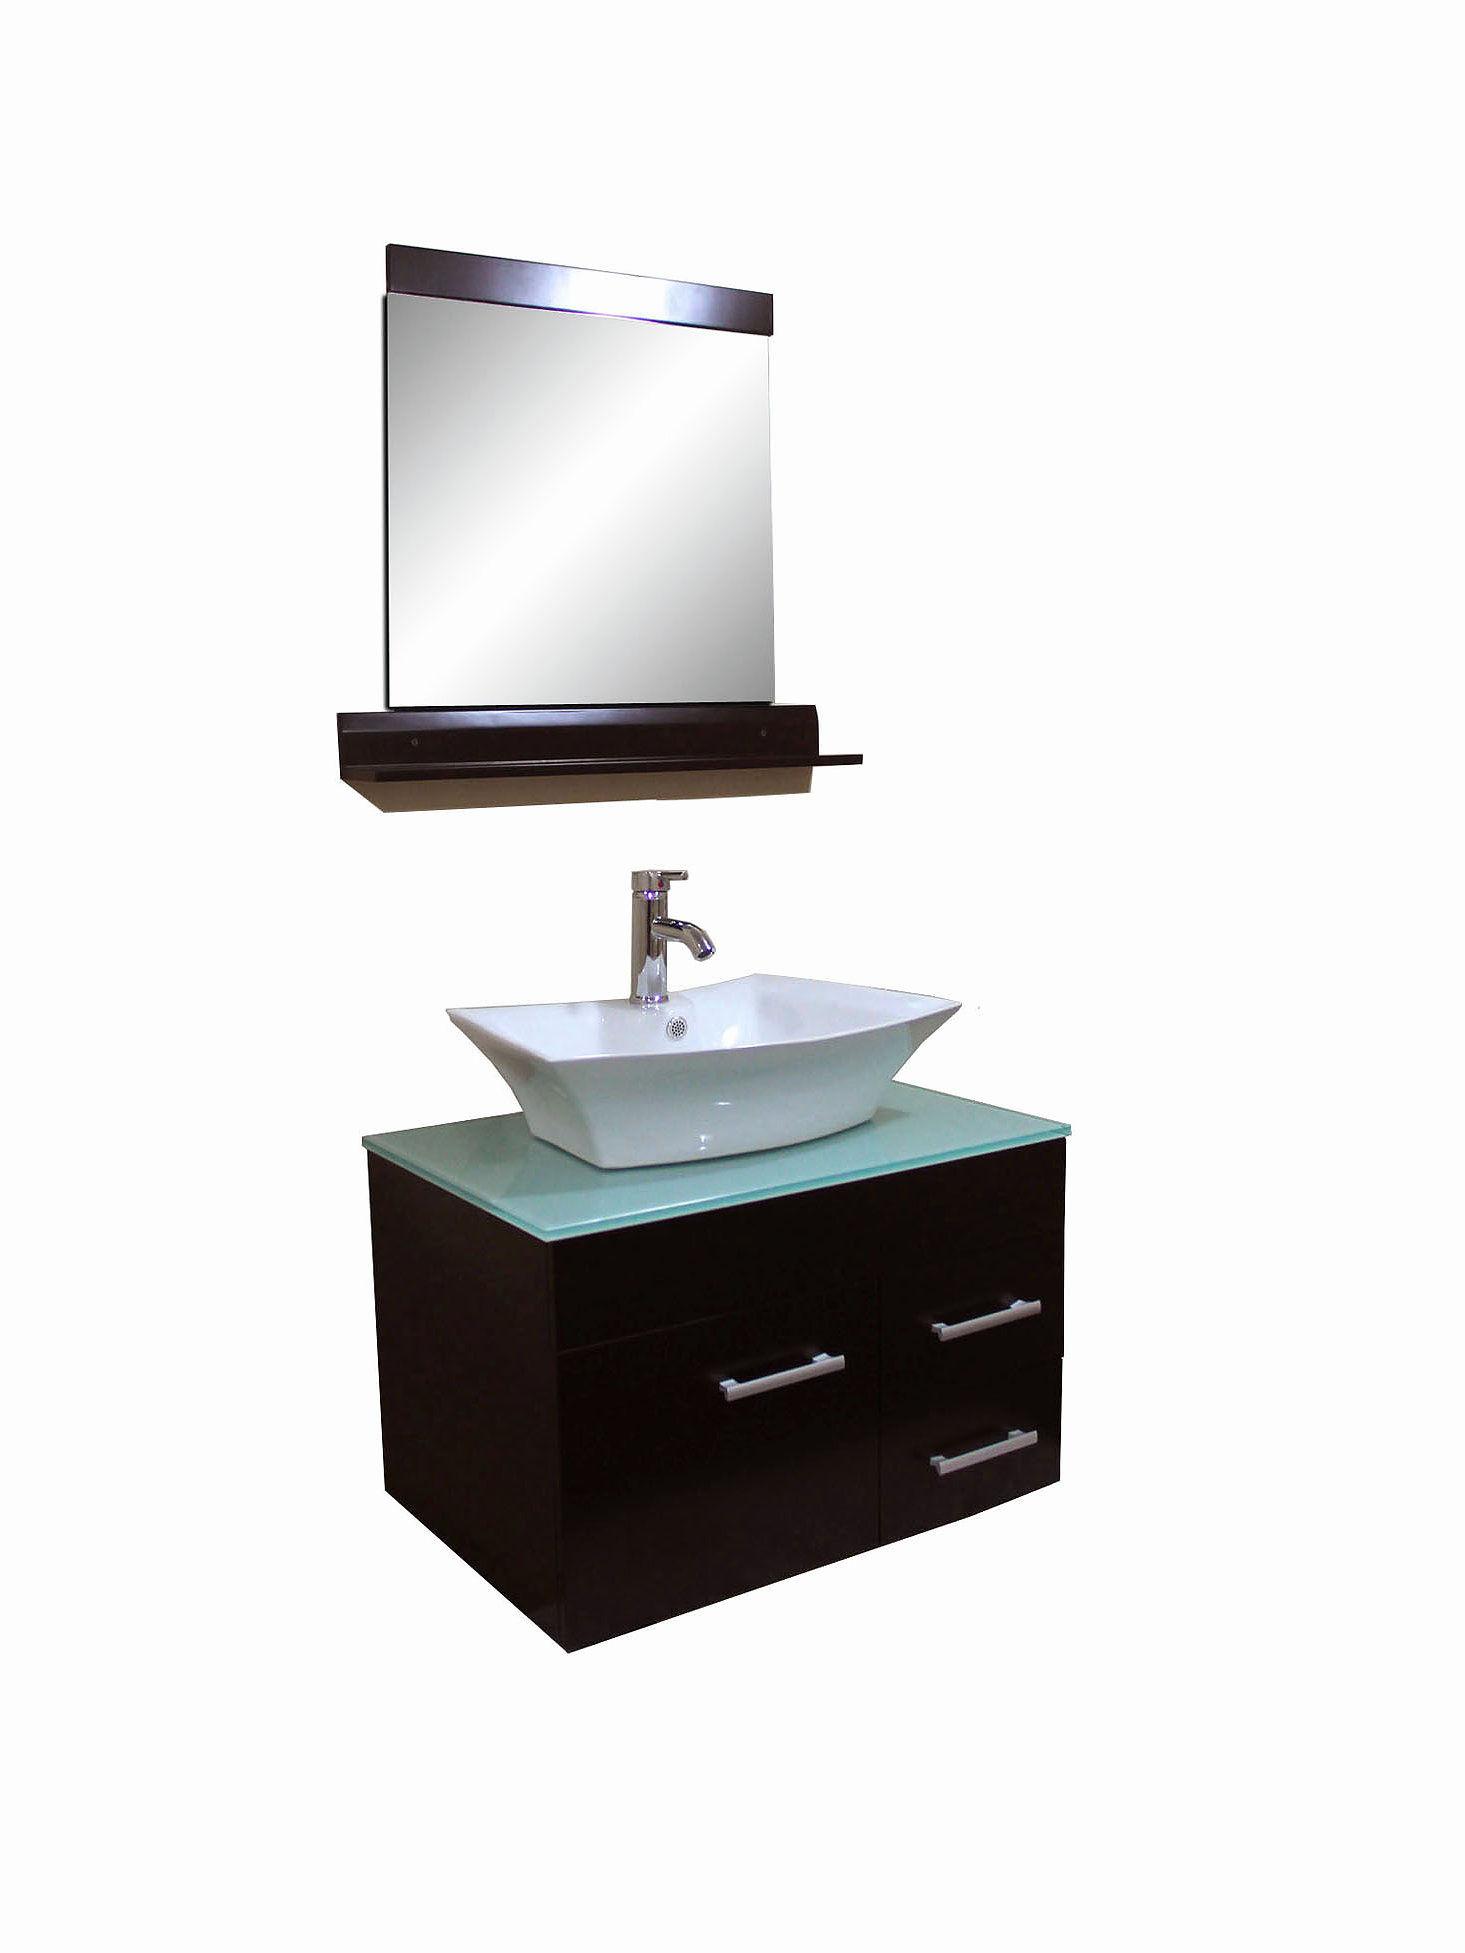 new wayfair bathroom sinks architecture-Fantastic Wayfair Bathroom Sinks Portrait